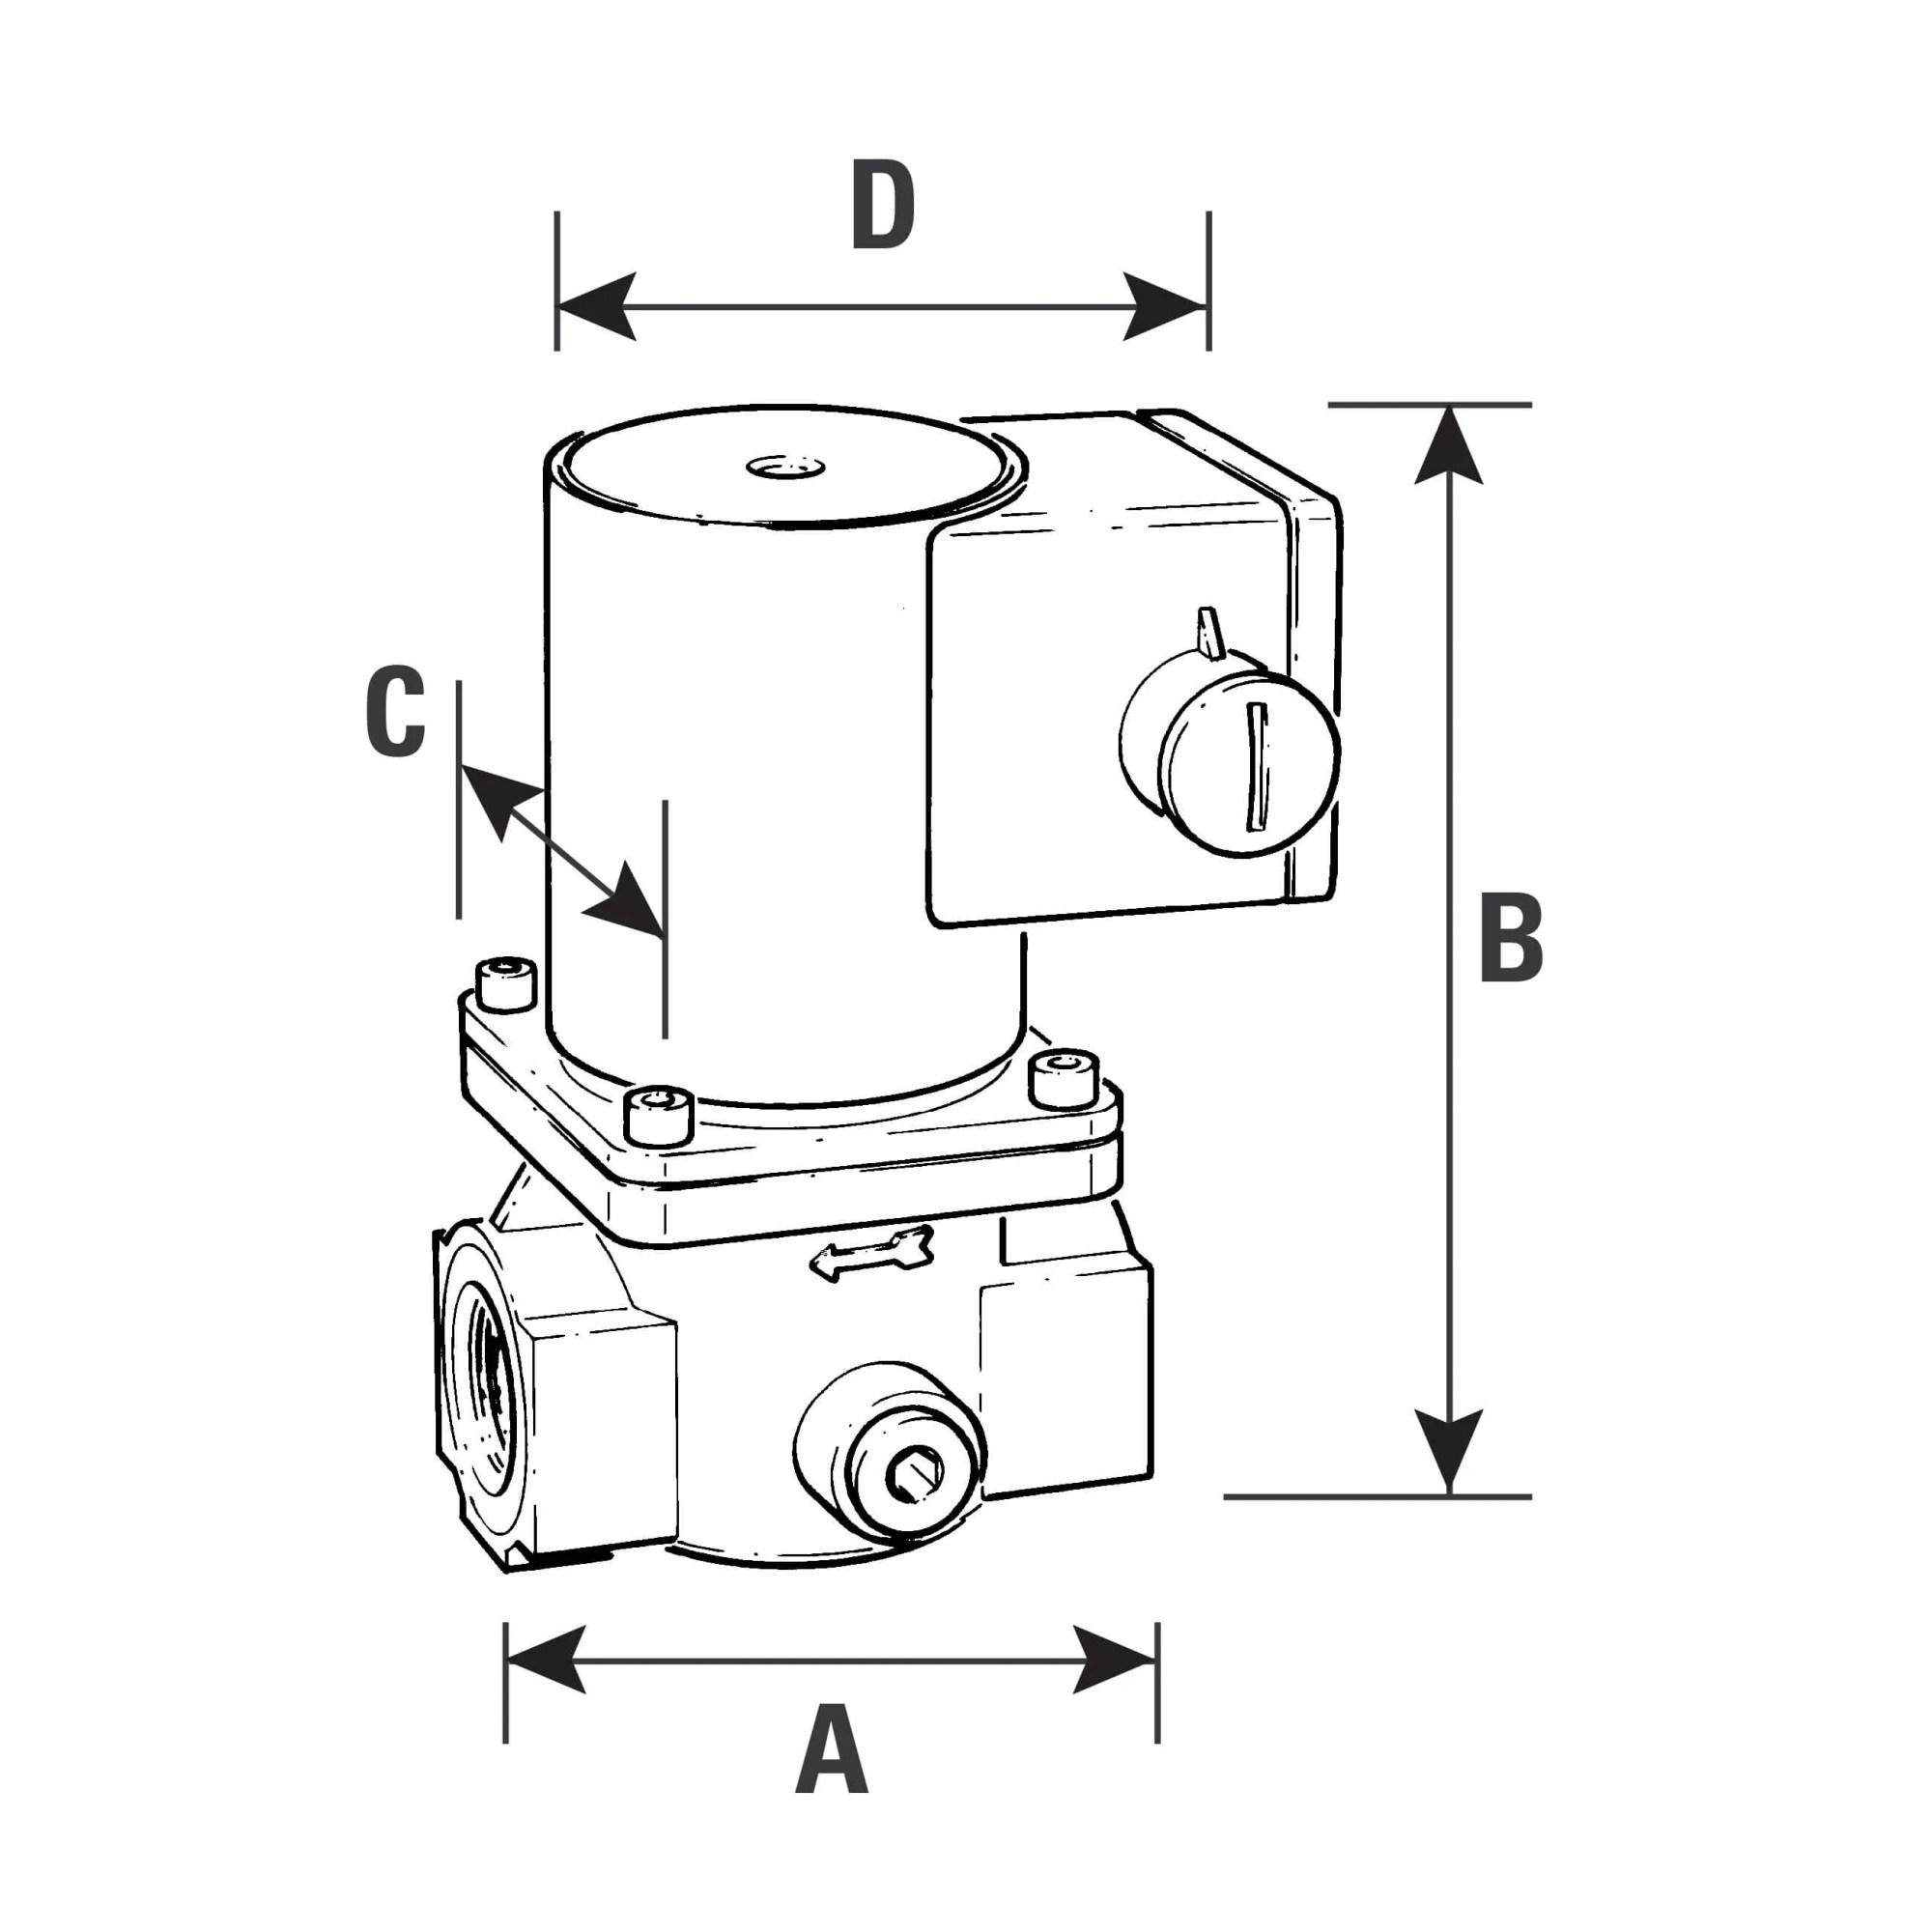 hight resolution of solenoid gas safety shut off valve 2